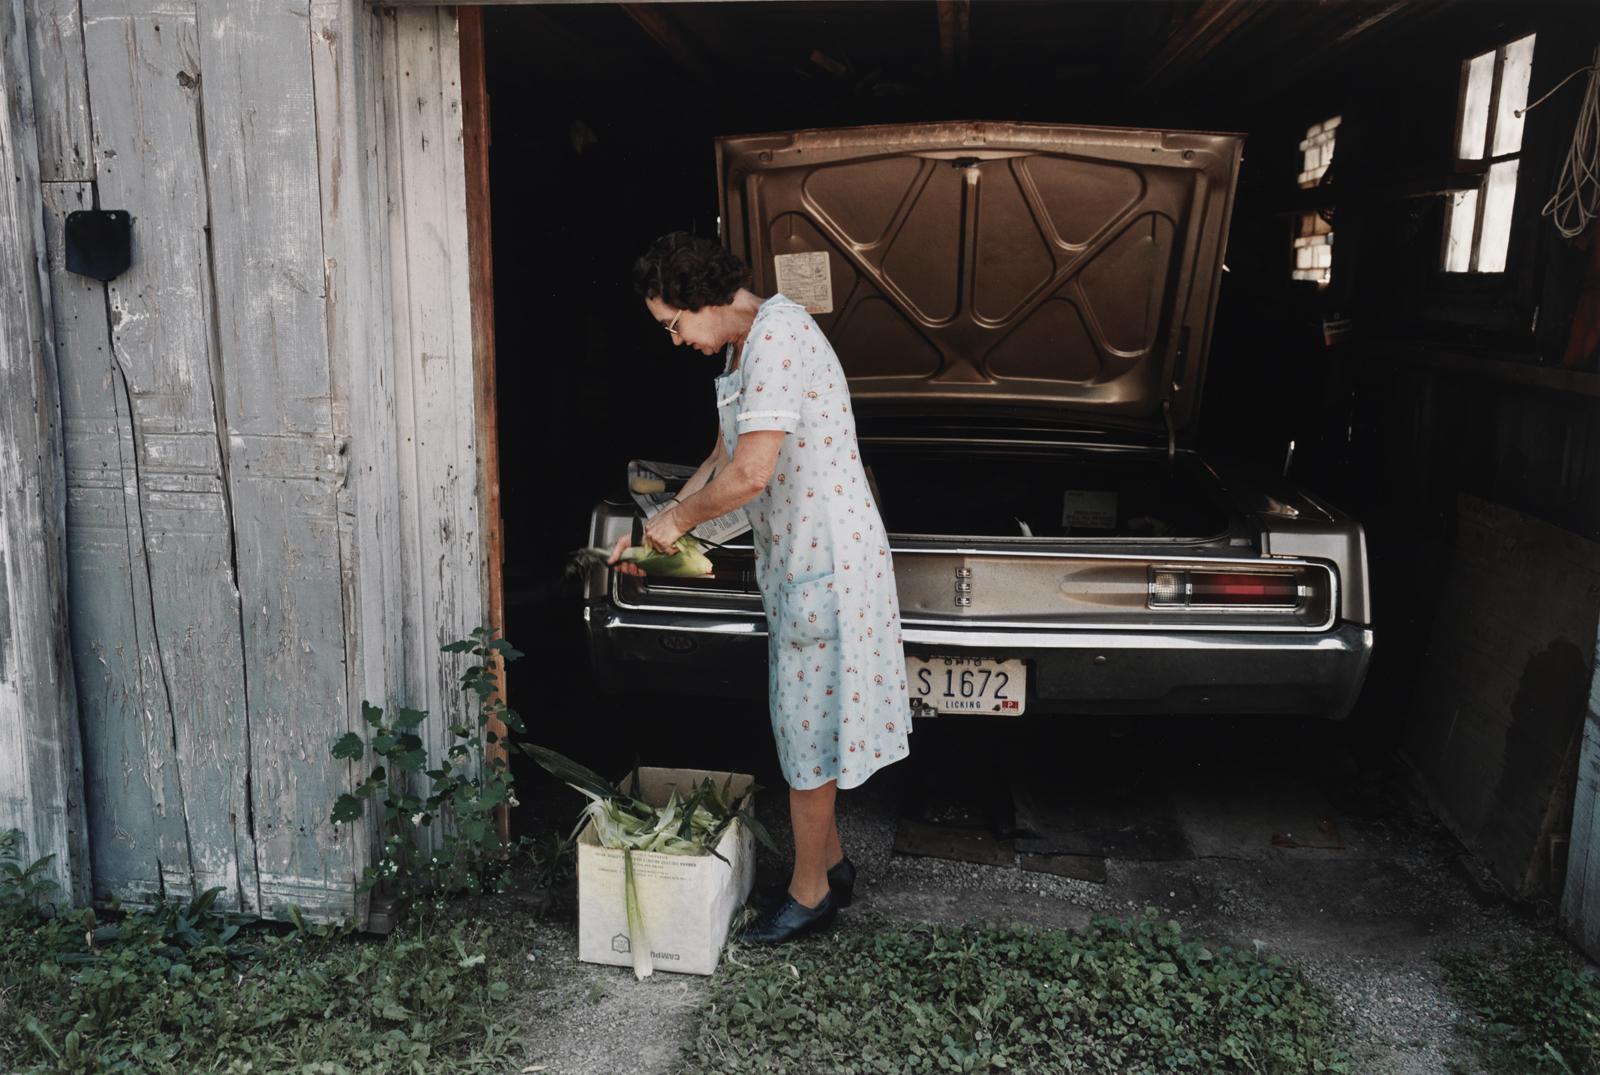 © Sheron Rupp, Utica, Ohio, 1984